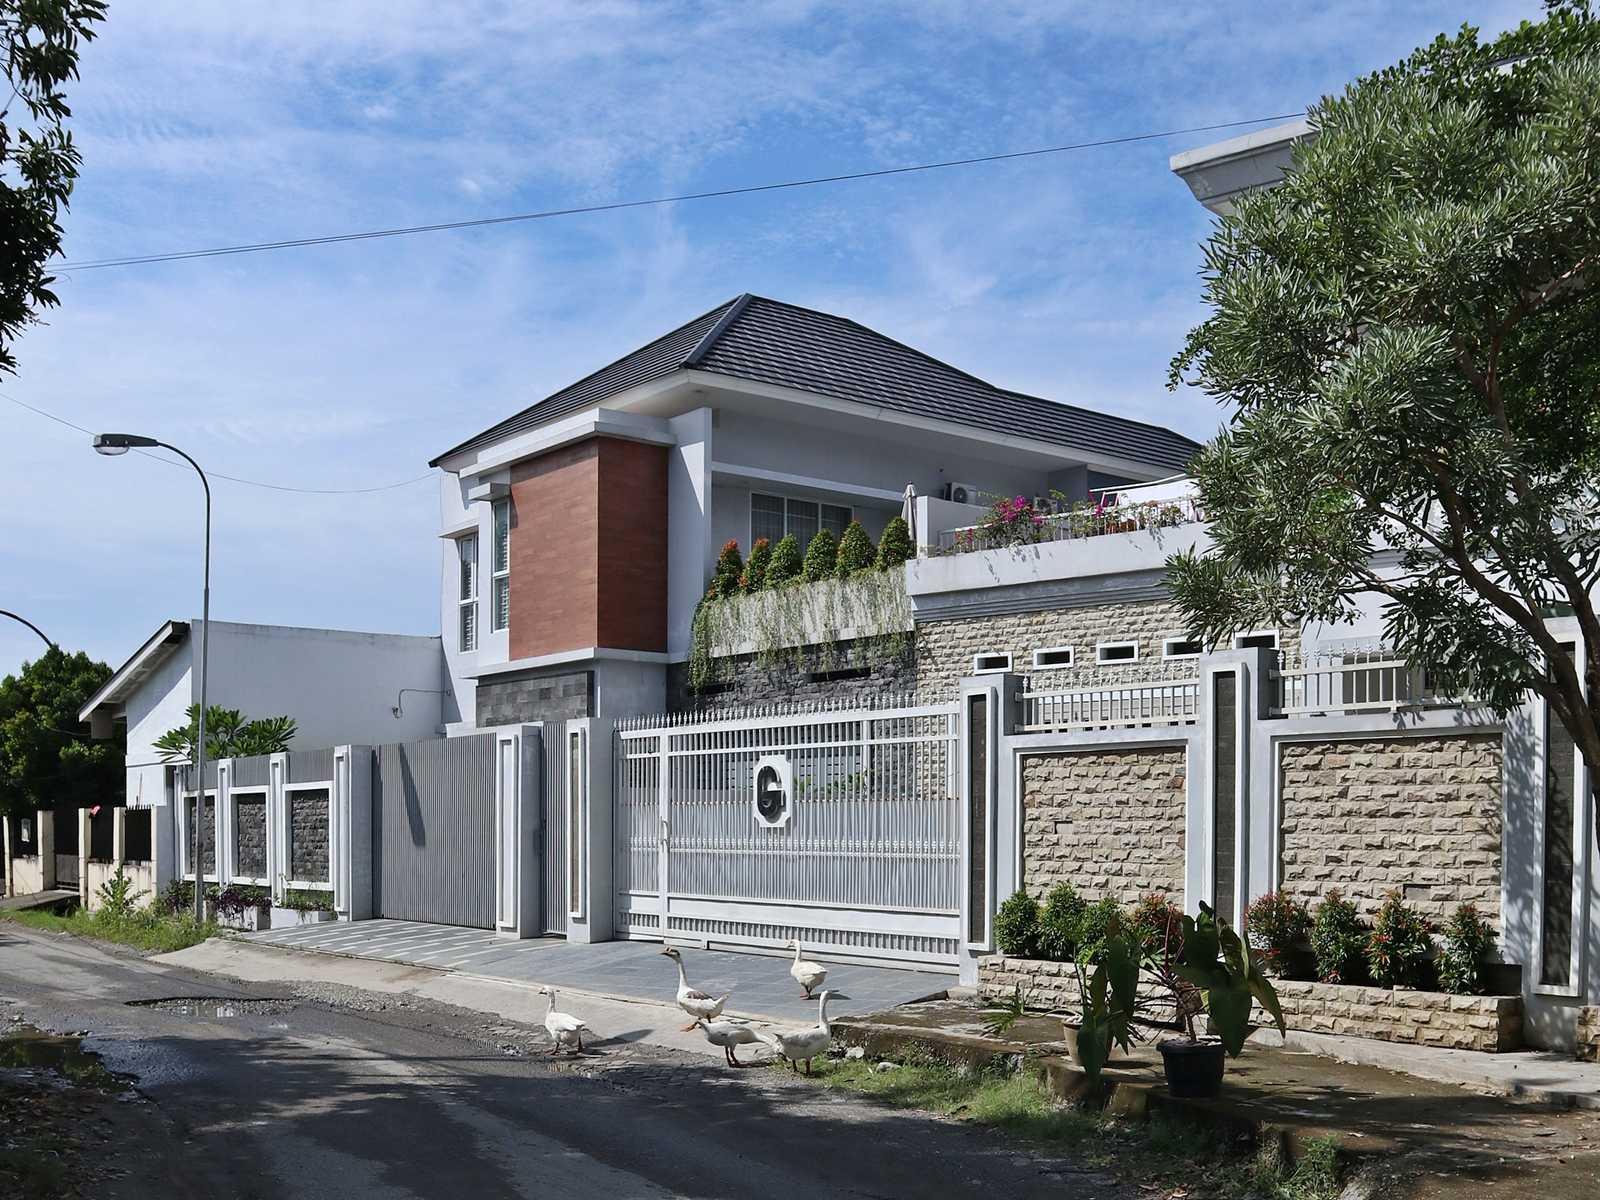 Bd Studio Ds House Medan, Kota Medan, Sumatera Utara, Indonesia Medan, Kota Medan, Sumatera Utara, Indonesia Bd-Studio-Ds-House   73818